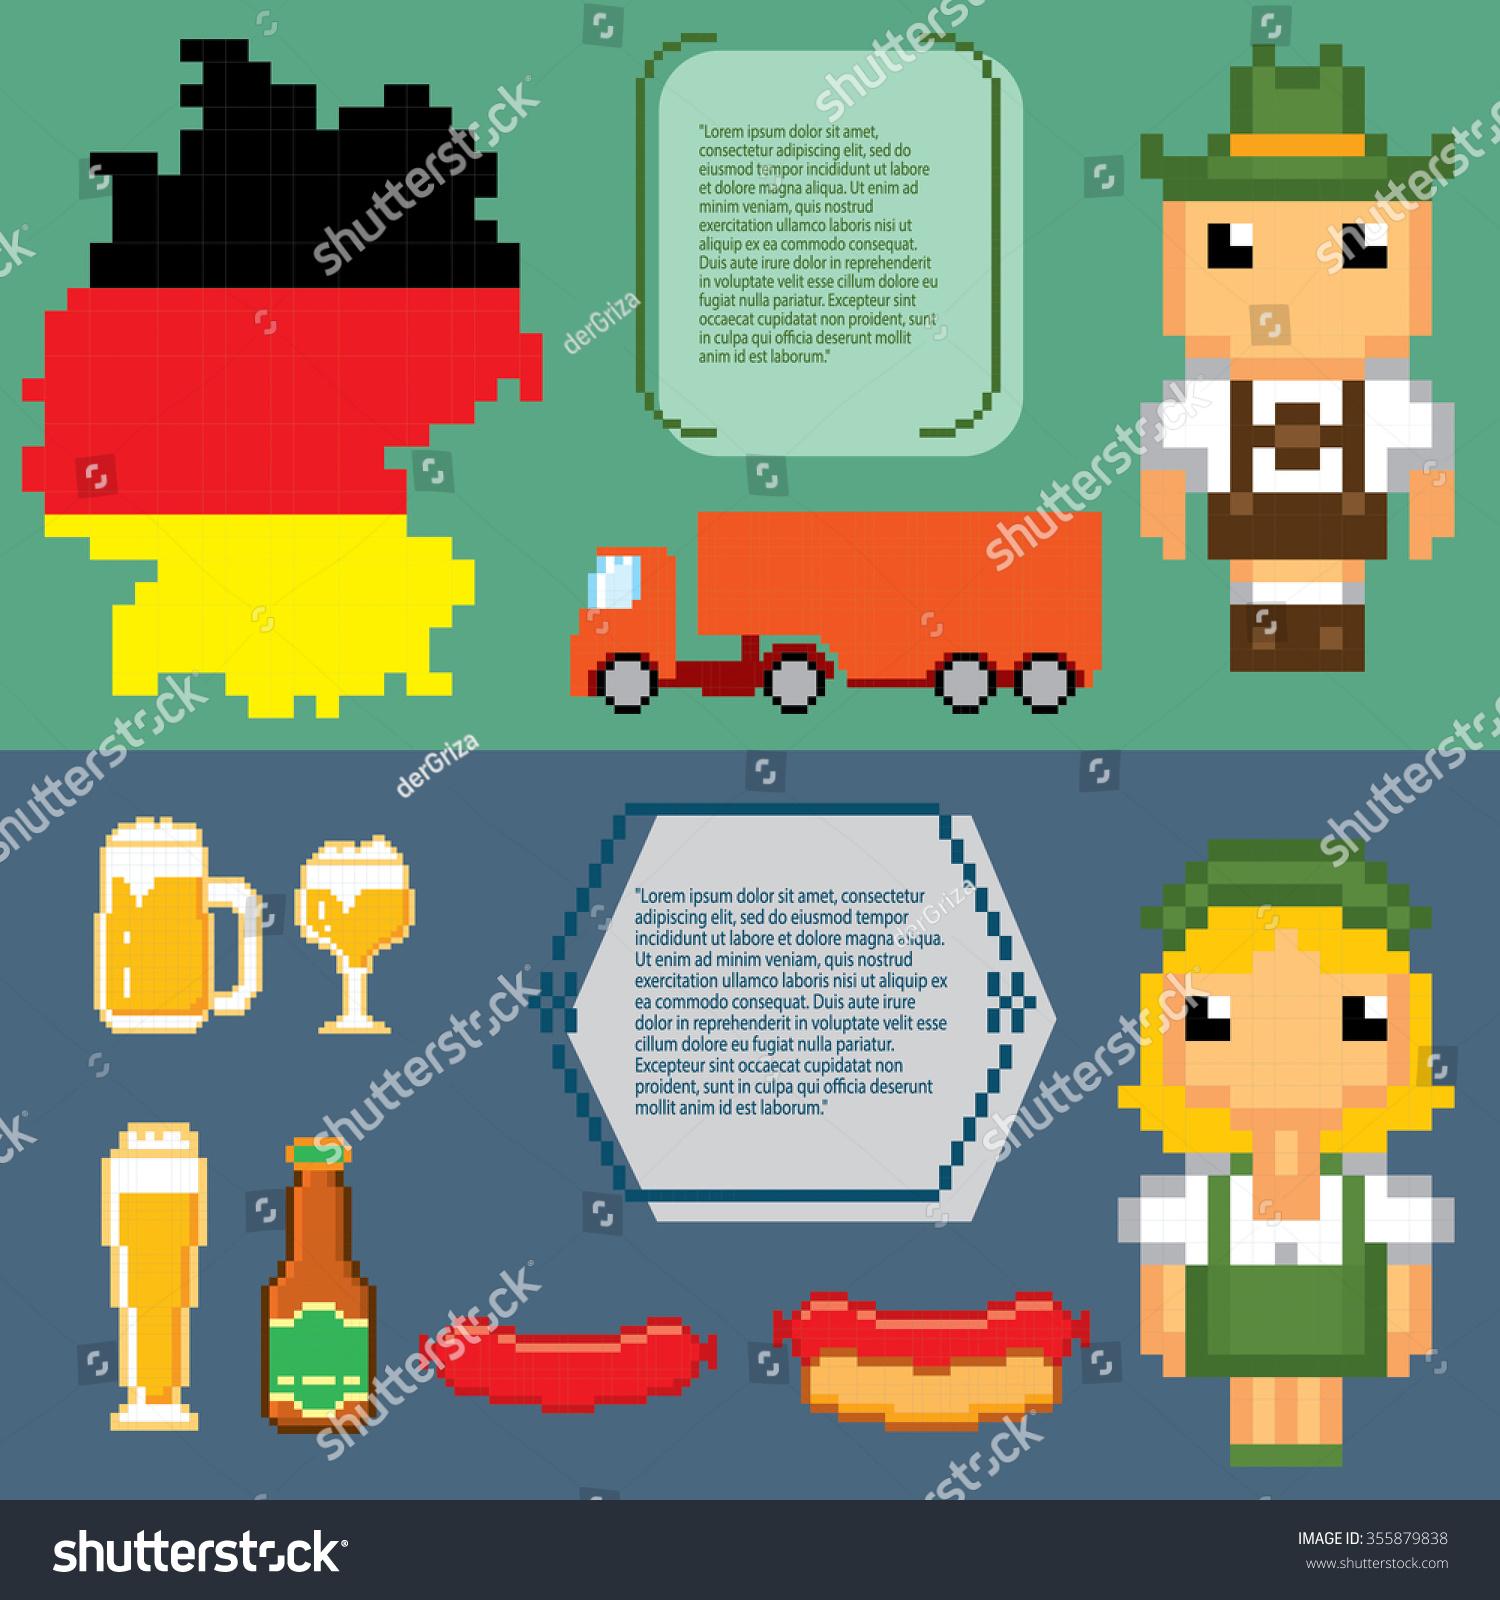 German Culture Symbols Banners Pixel Art Stock Vector 355879838